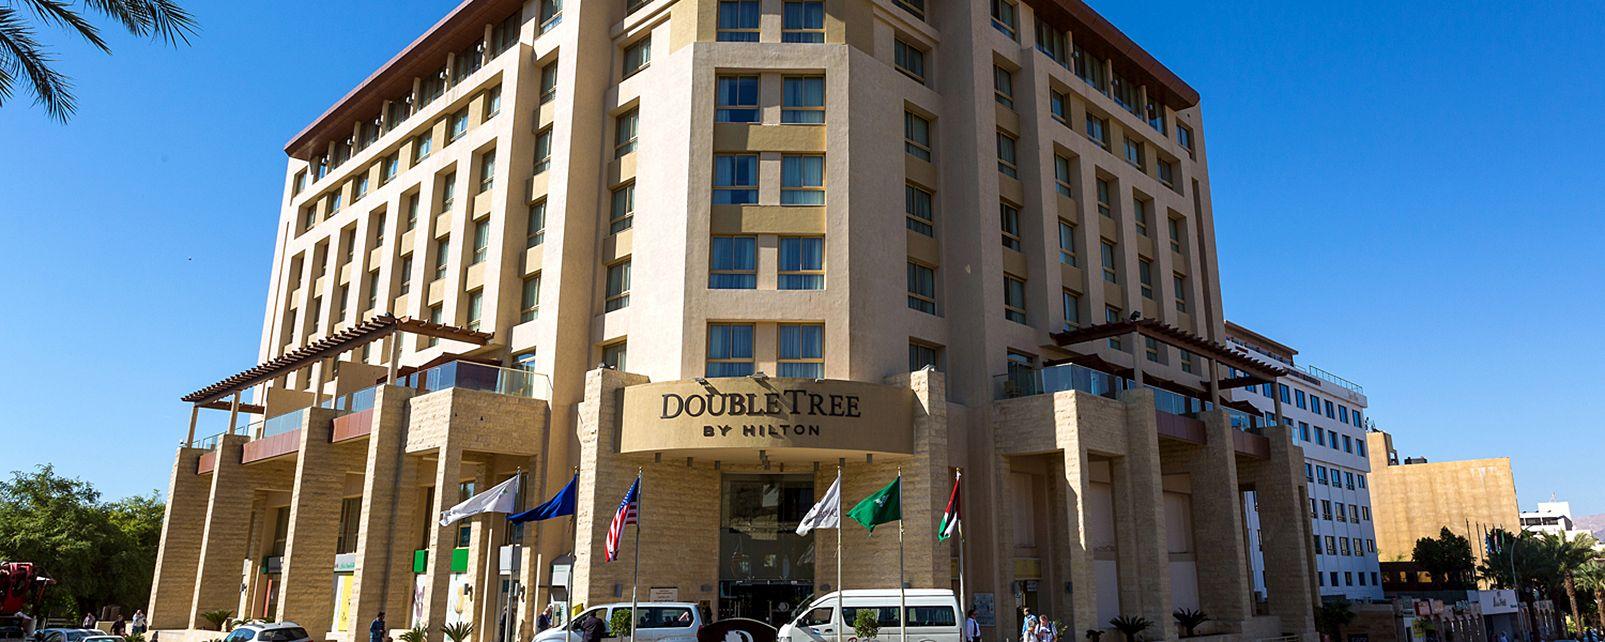 Hôtel Doubletree by Hilton Aqaba